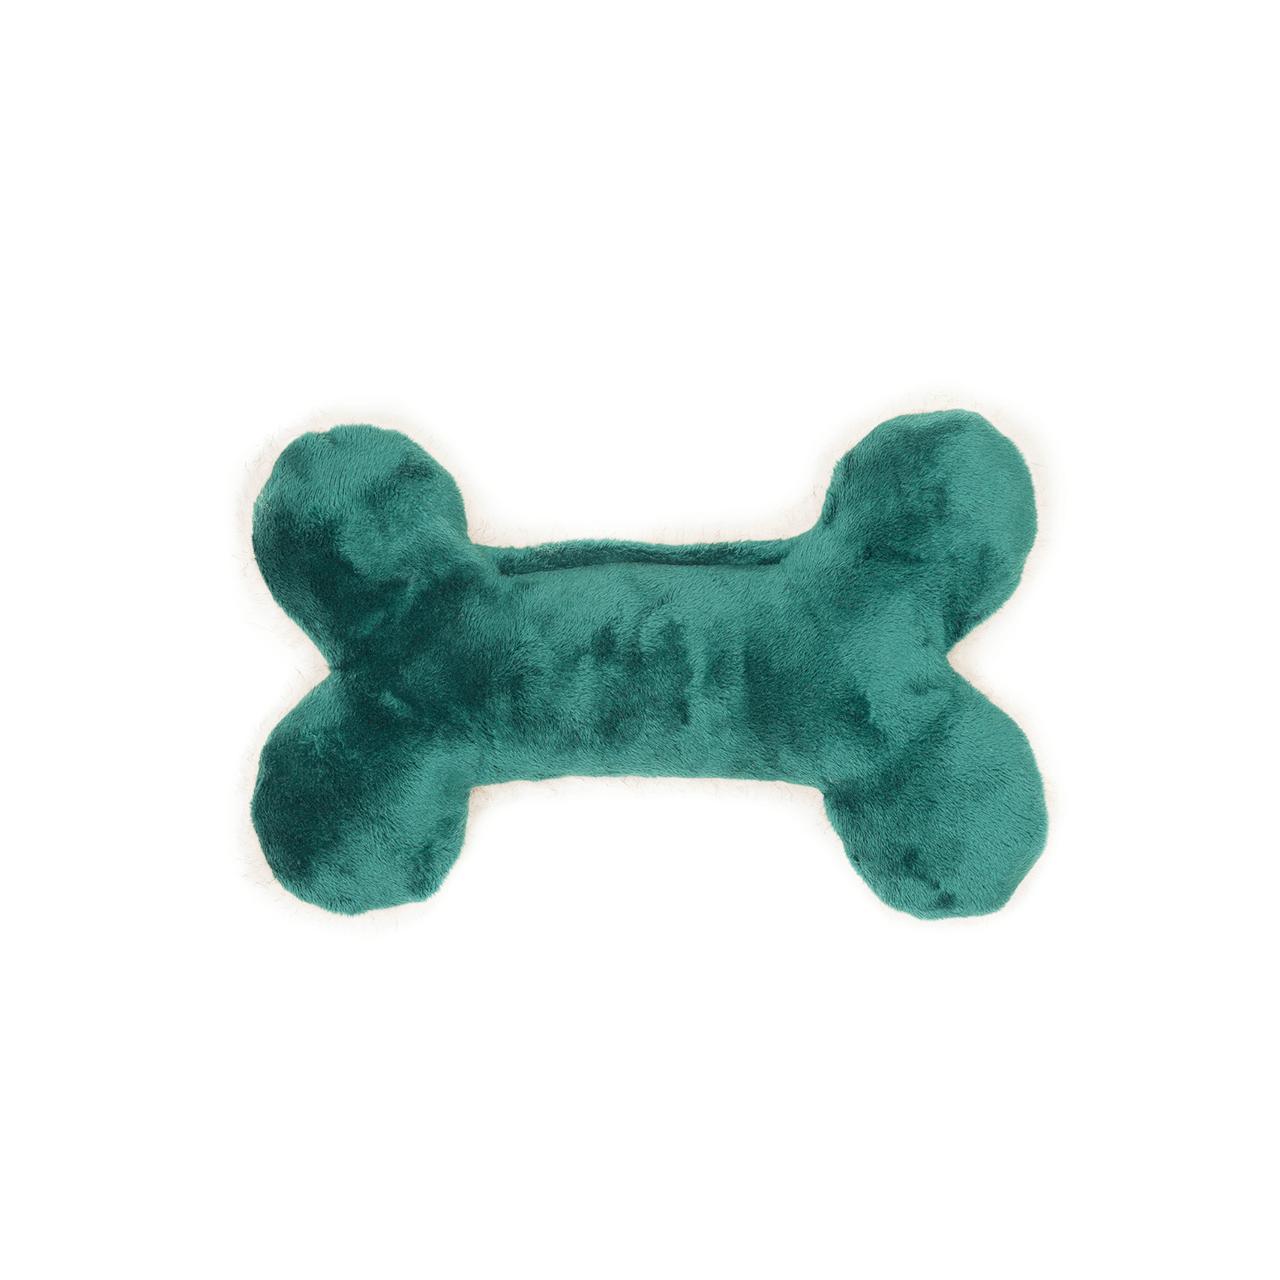 https://dogkart.in/ImageUploads/WP_Merry_Bone_Emrald_.png